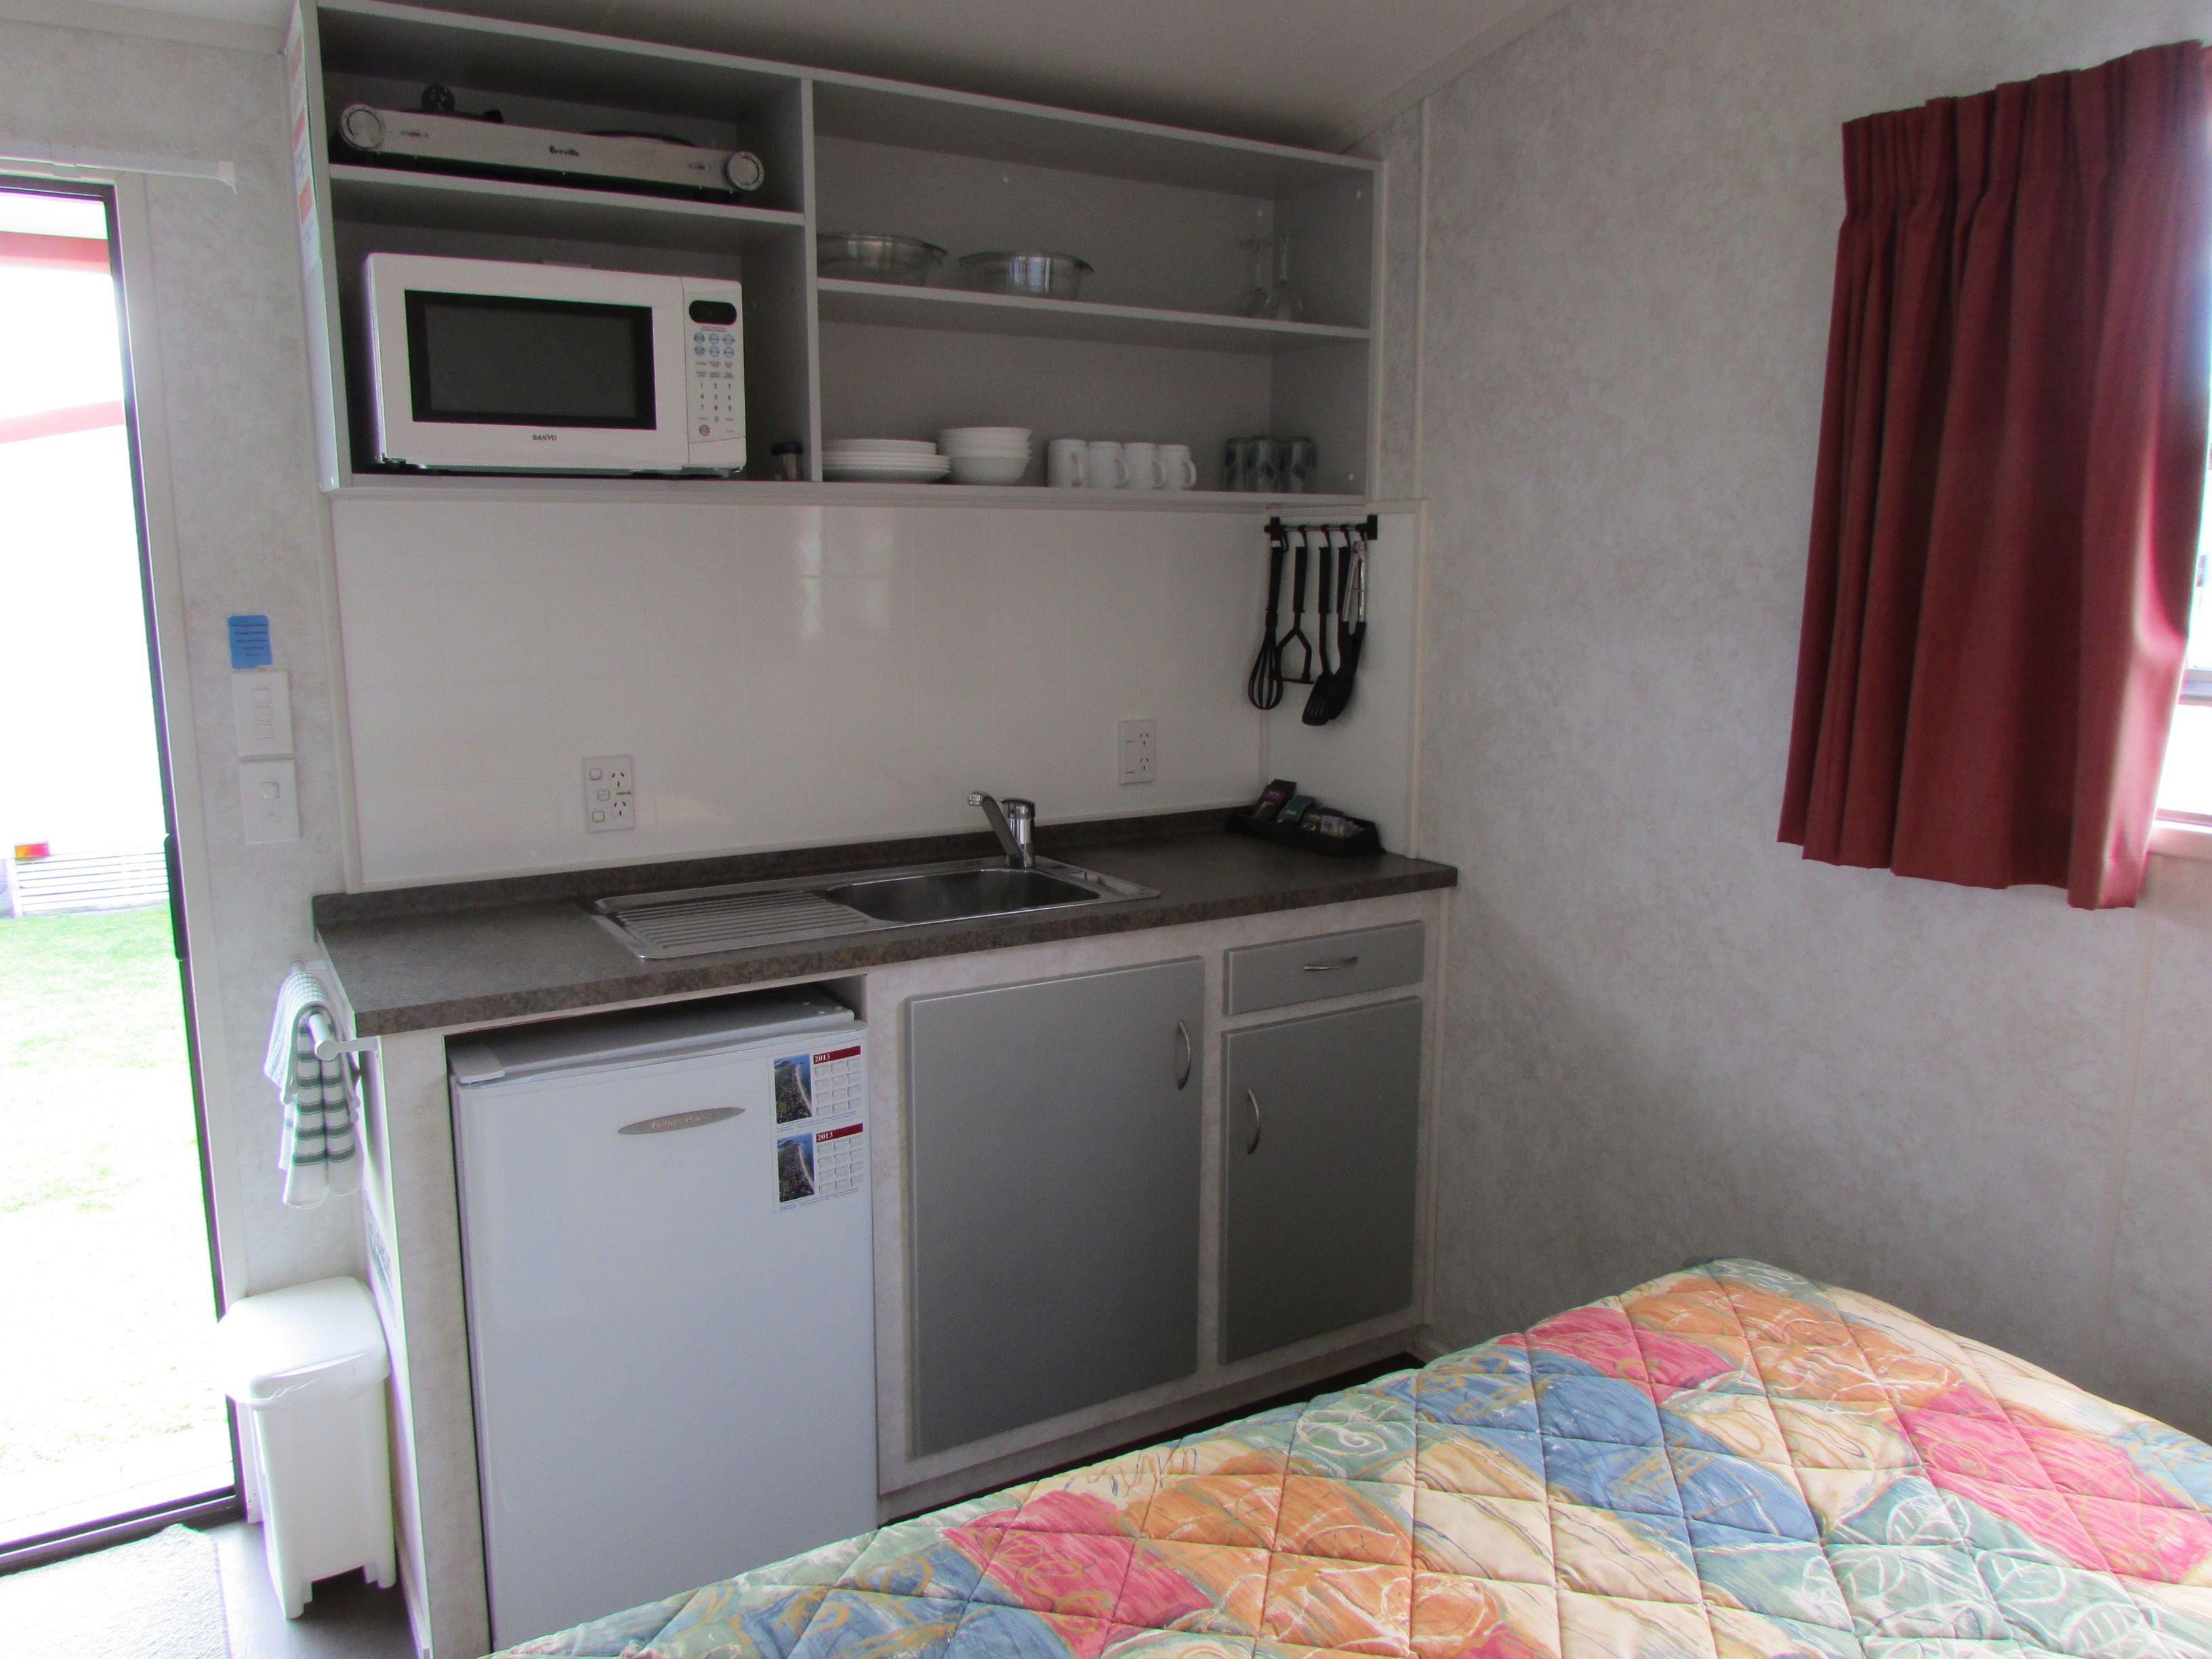 Kitchenette - Studio Plus Unit, Cosy Corner Holiday Park, Mt Maunganui, NZ